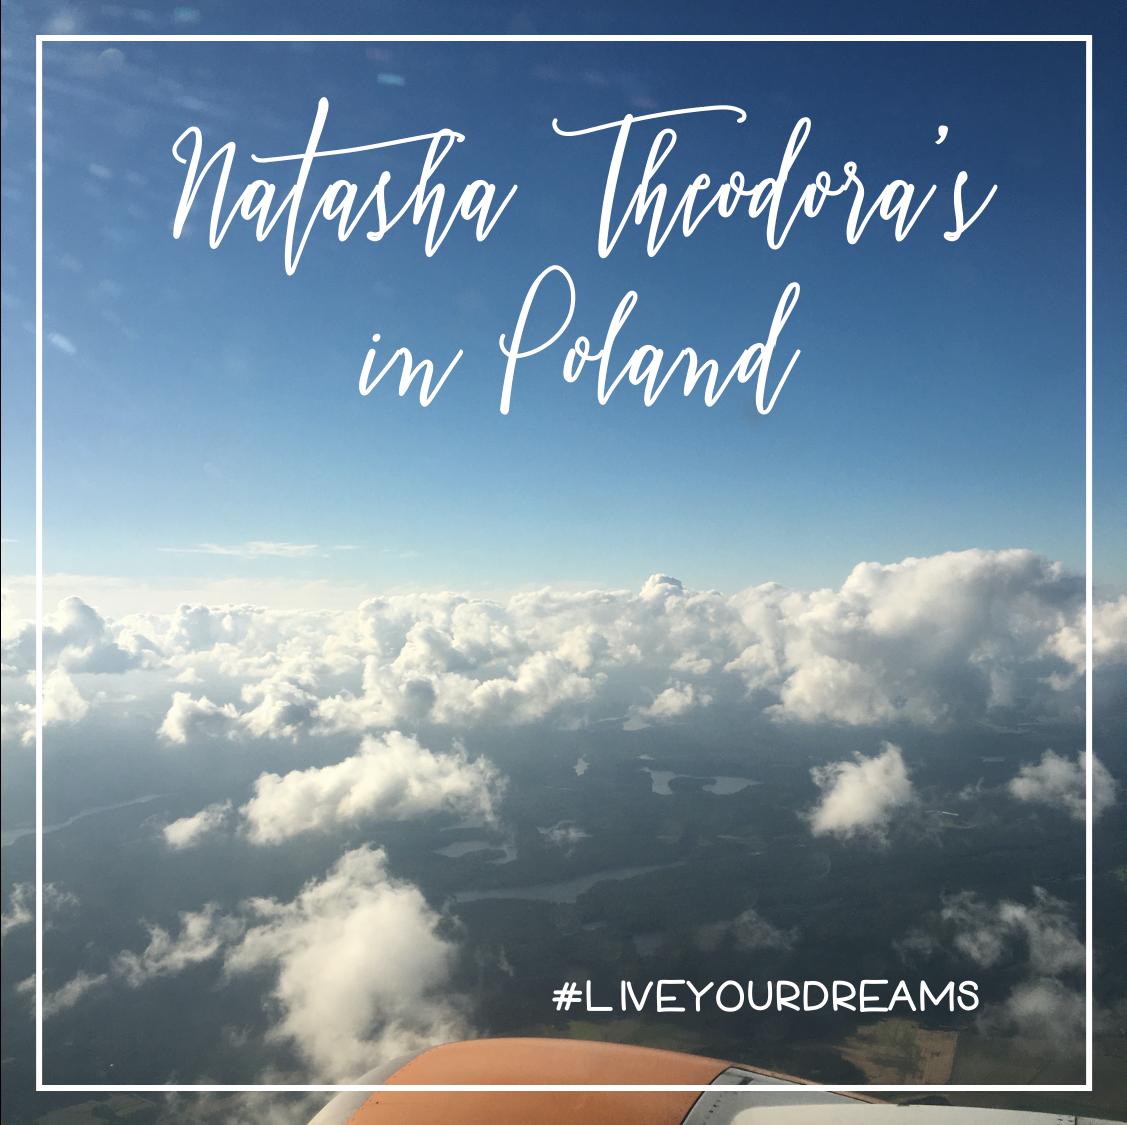 Natasha Theodora's in Poland